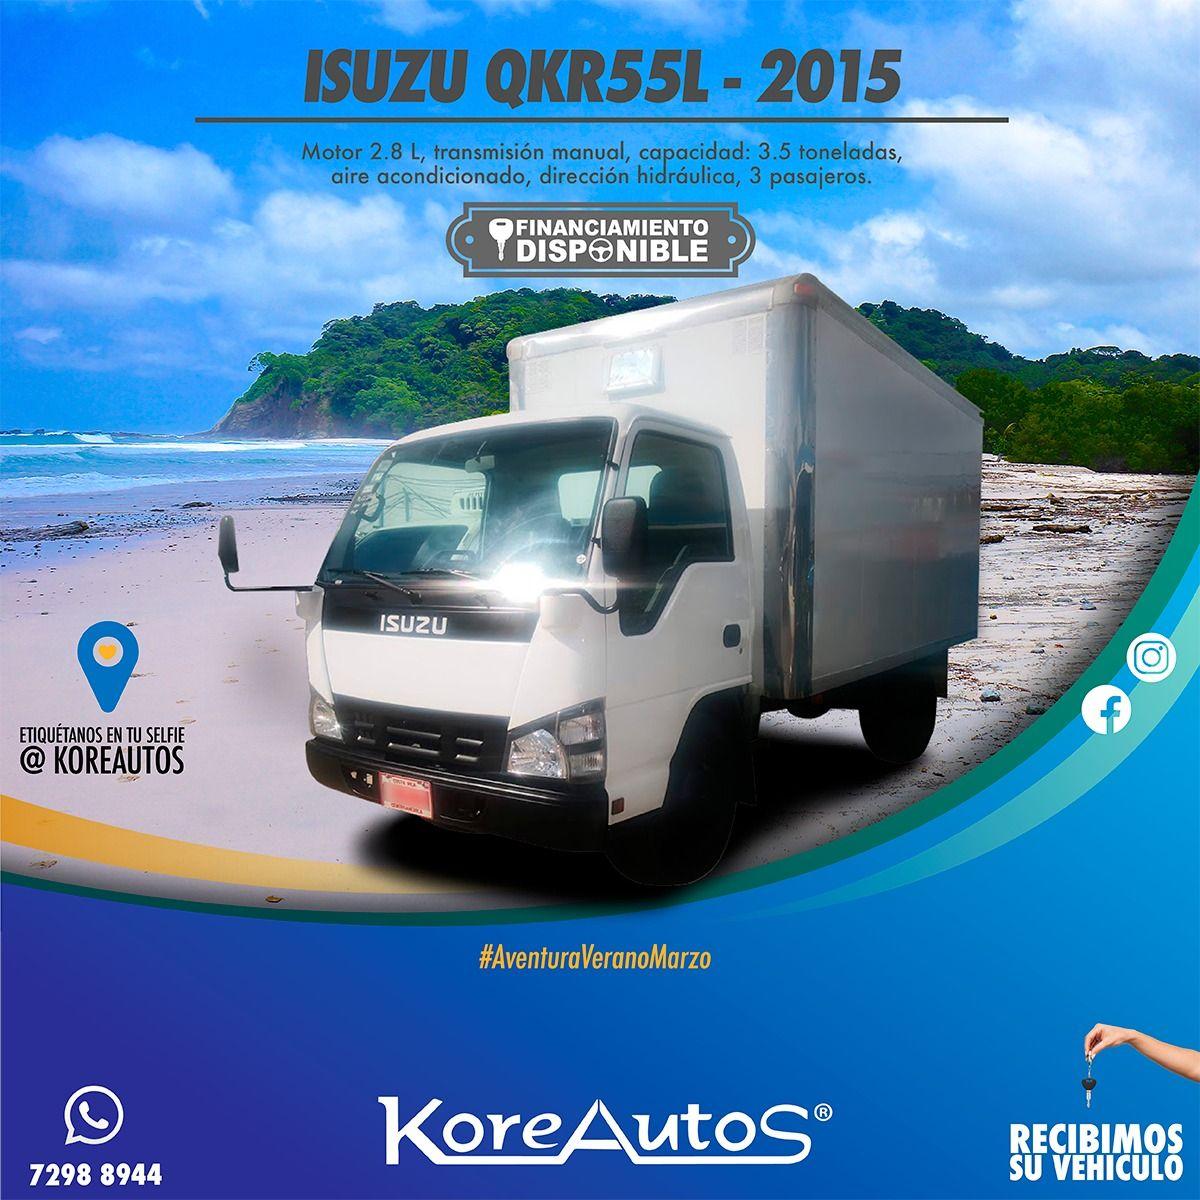 Isuzu Qkr55l 2015 Recreational Vehicles Vehicles